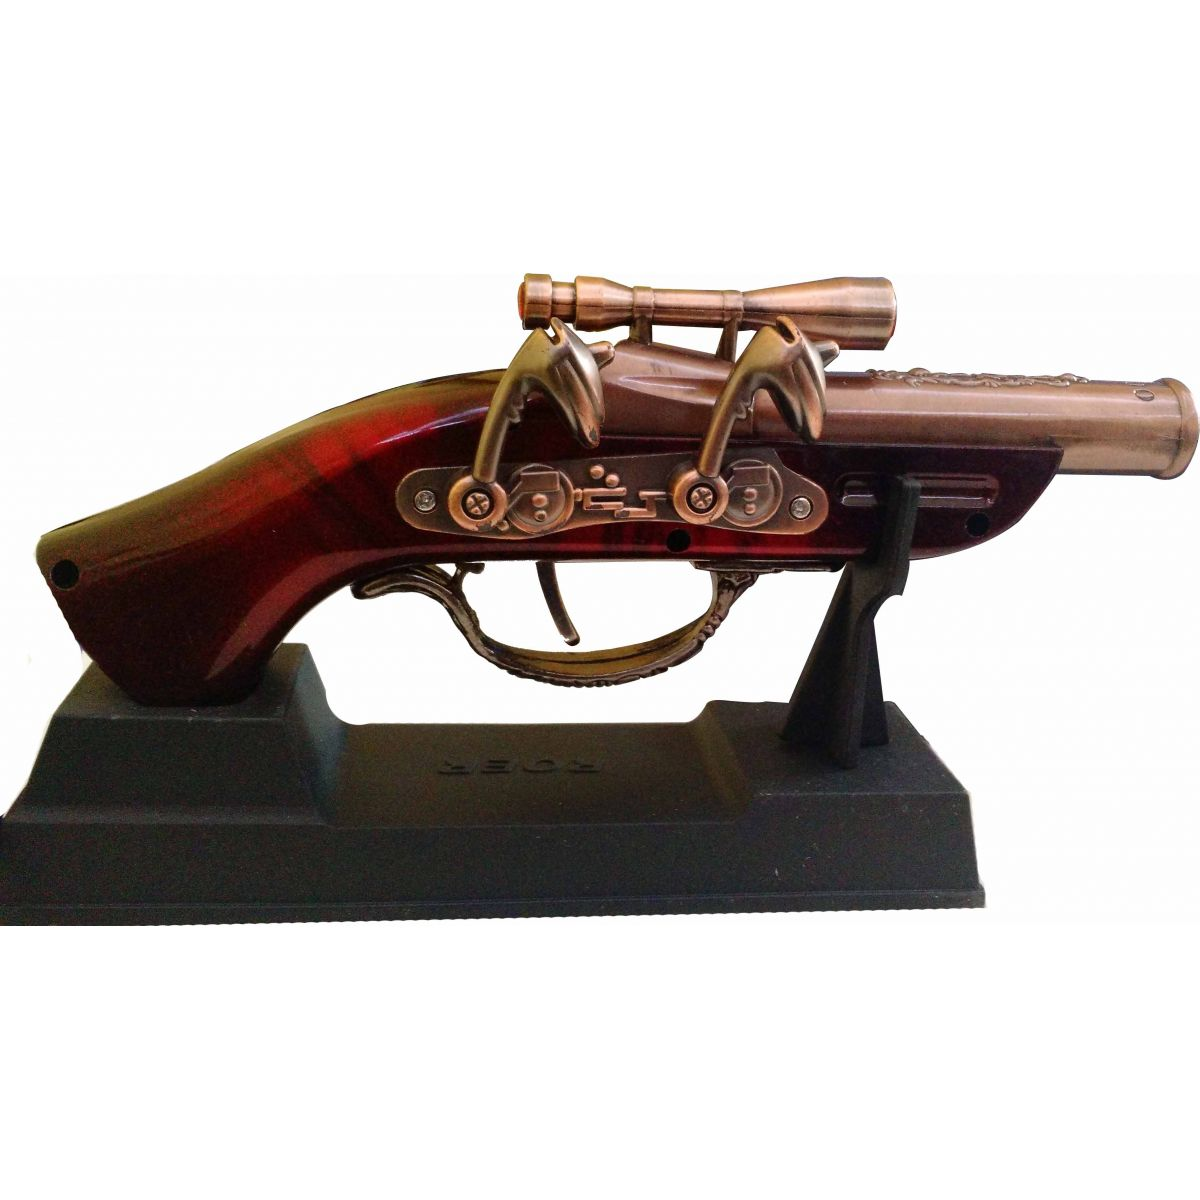 Isqueiro Maçarico Pistola  - Thata Esportes